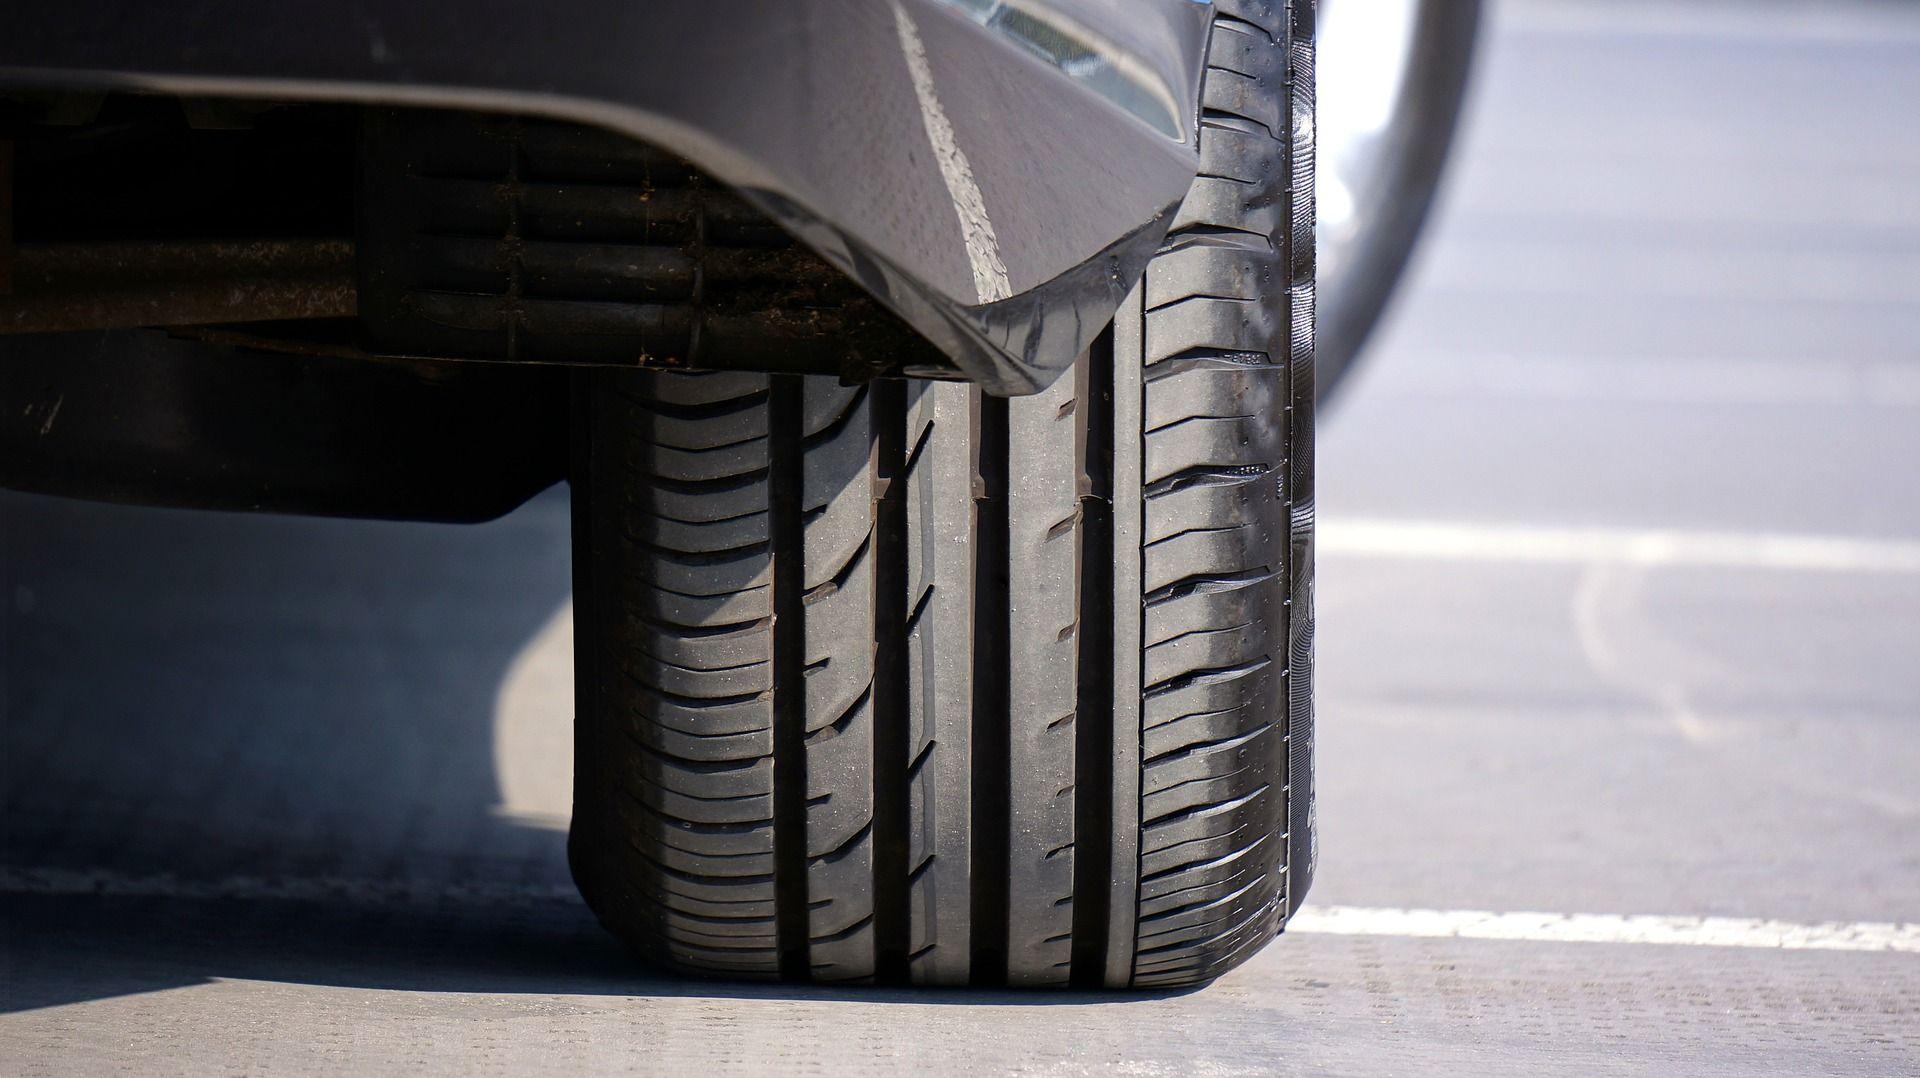 Datos curiosos sobre los neumáticos